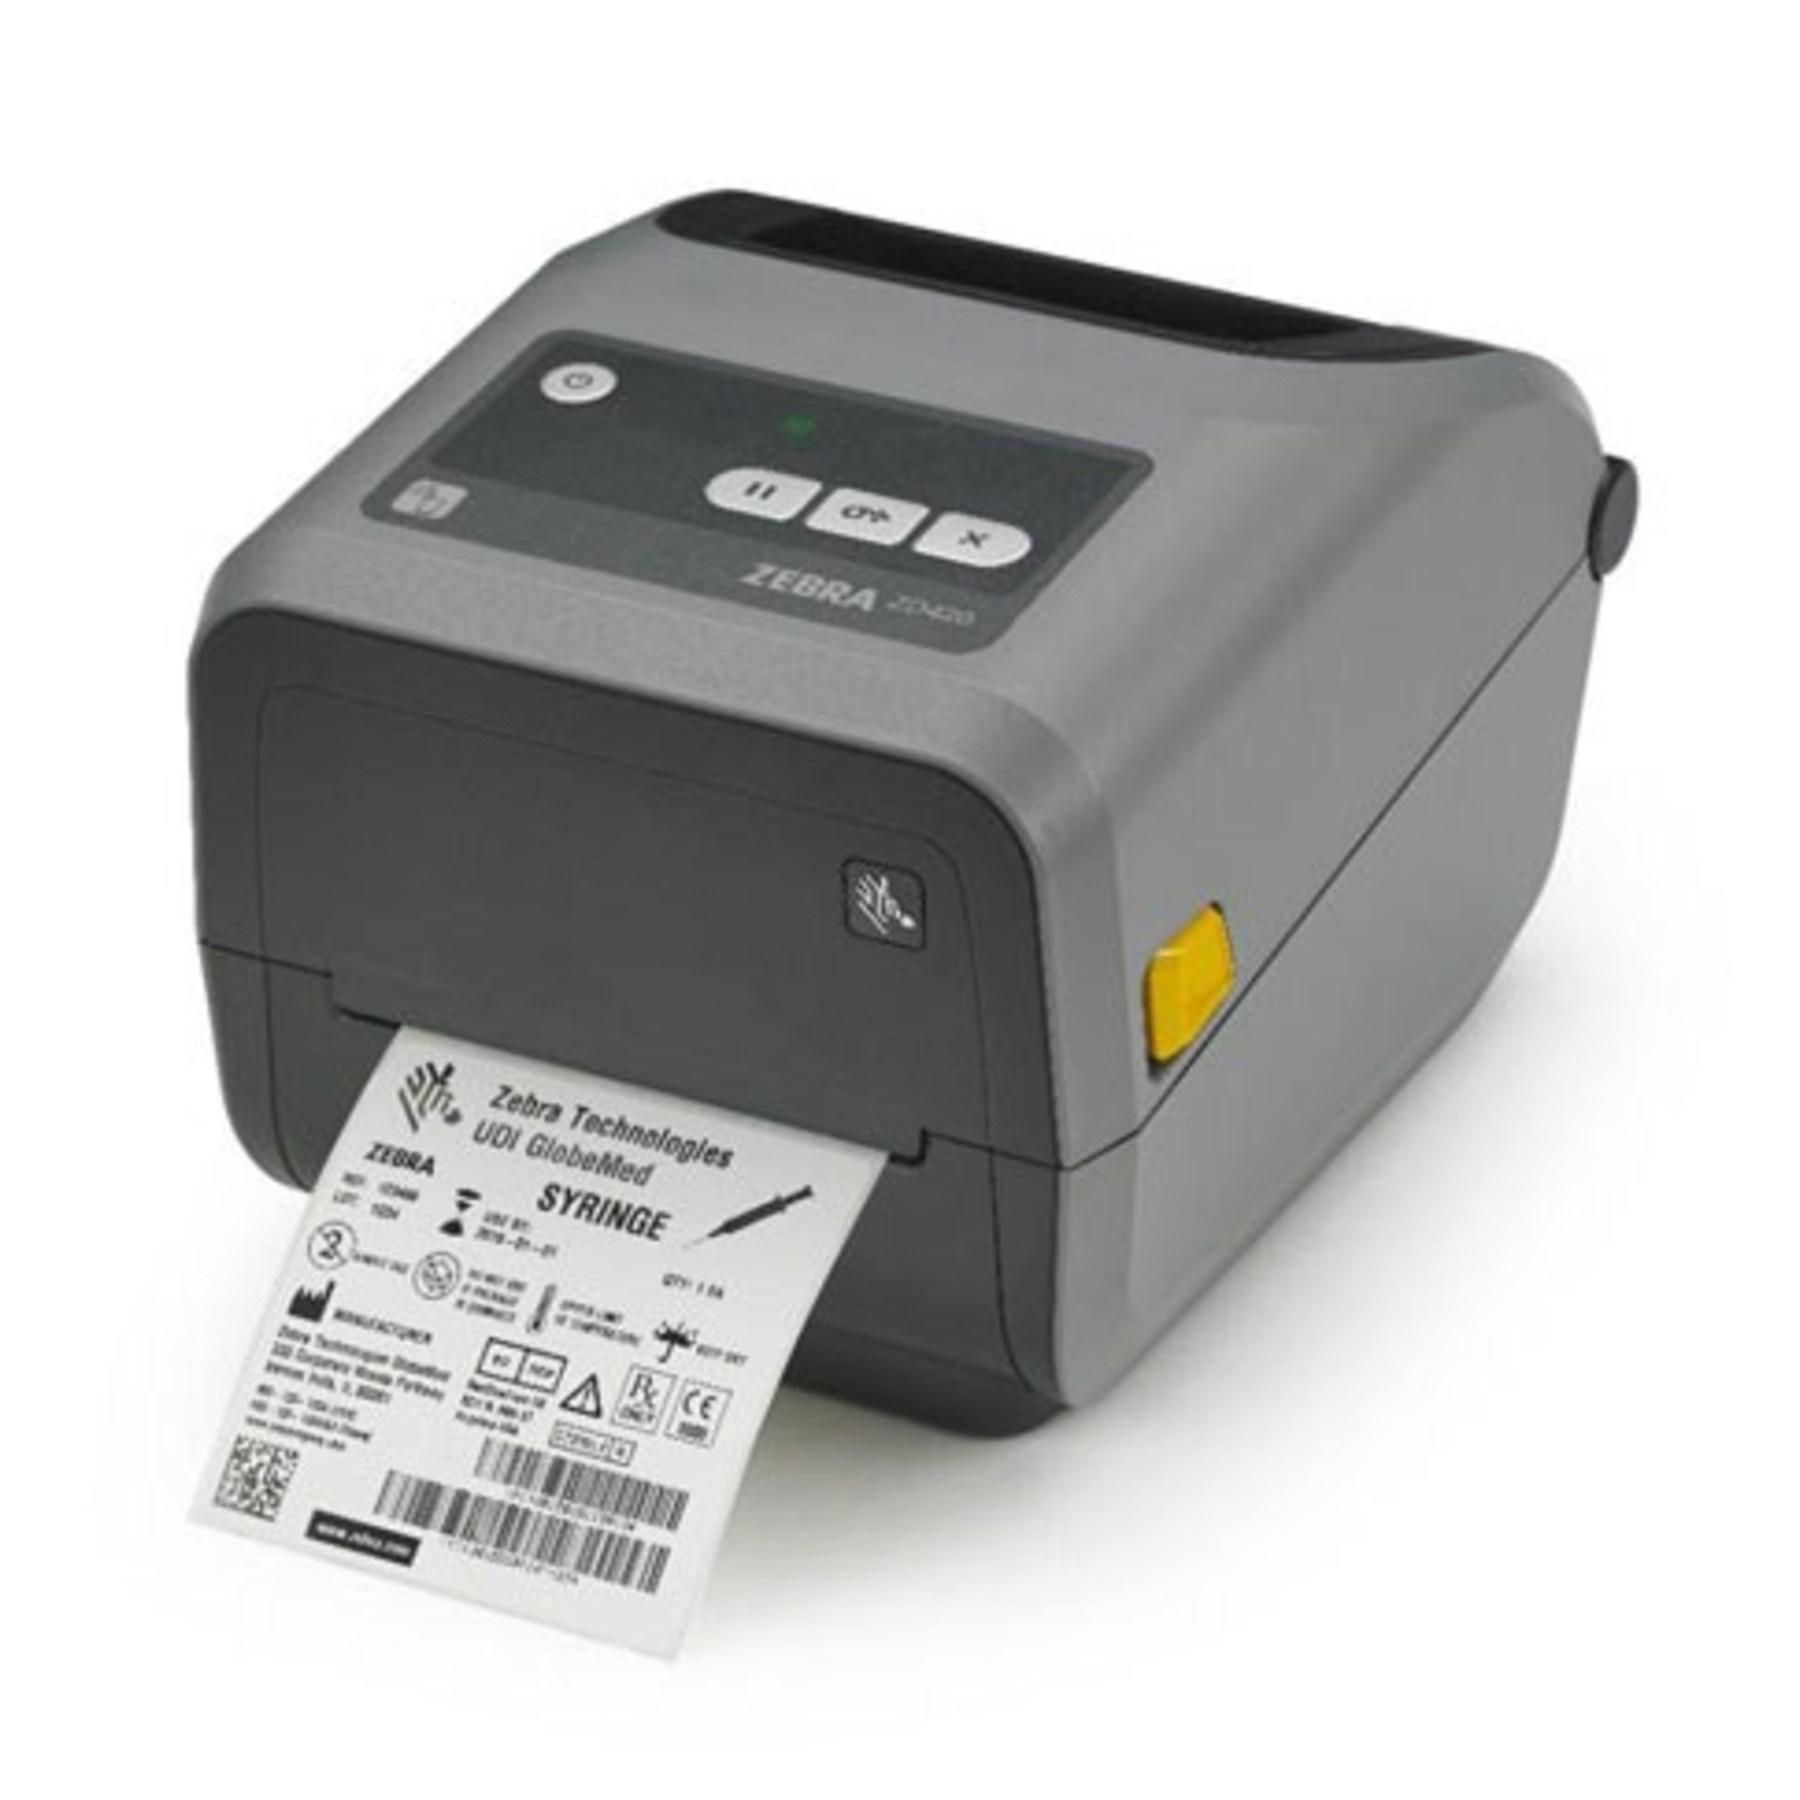 Zebra Zd420 Compact Label Printer Cash Drawers Ireland